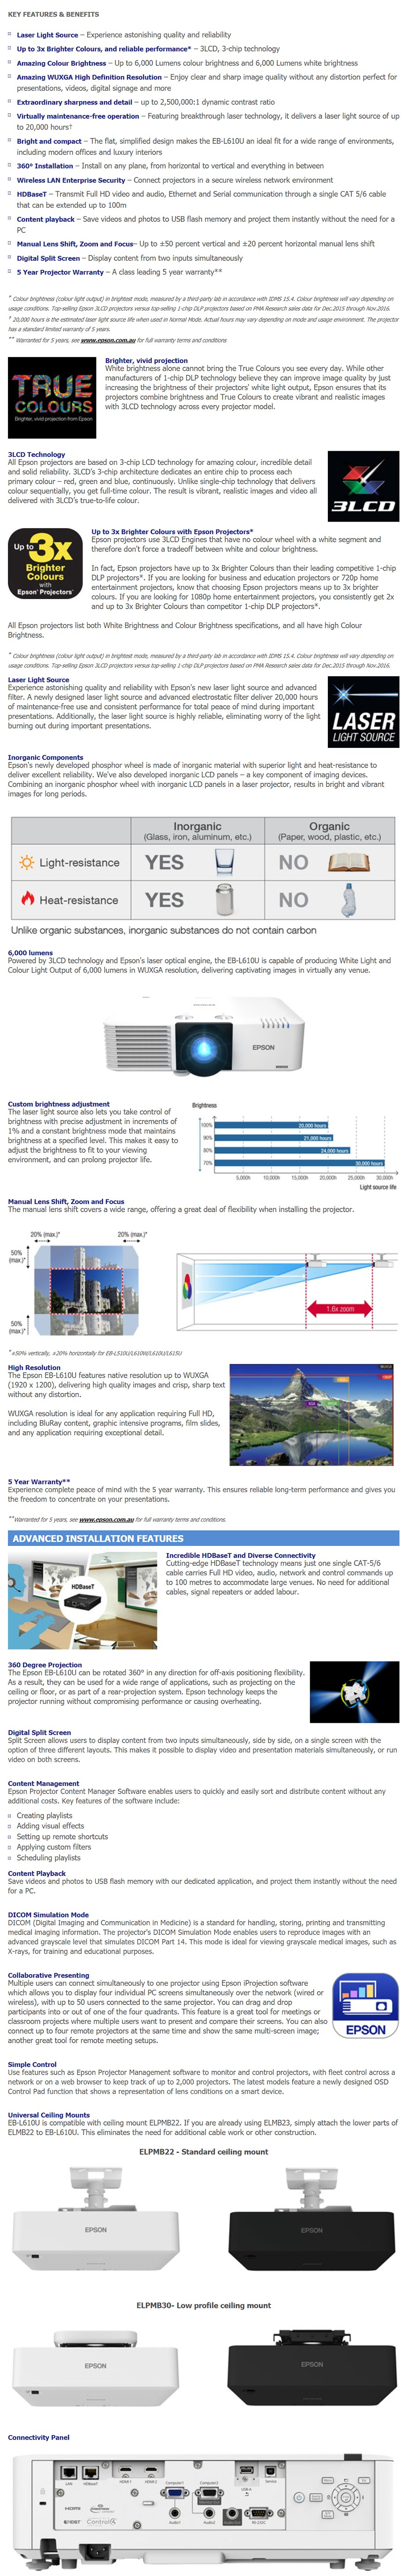 Epson EB-L610U WUXGA 3LCD Data Laser Projector - Desktop Overview 1